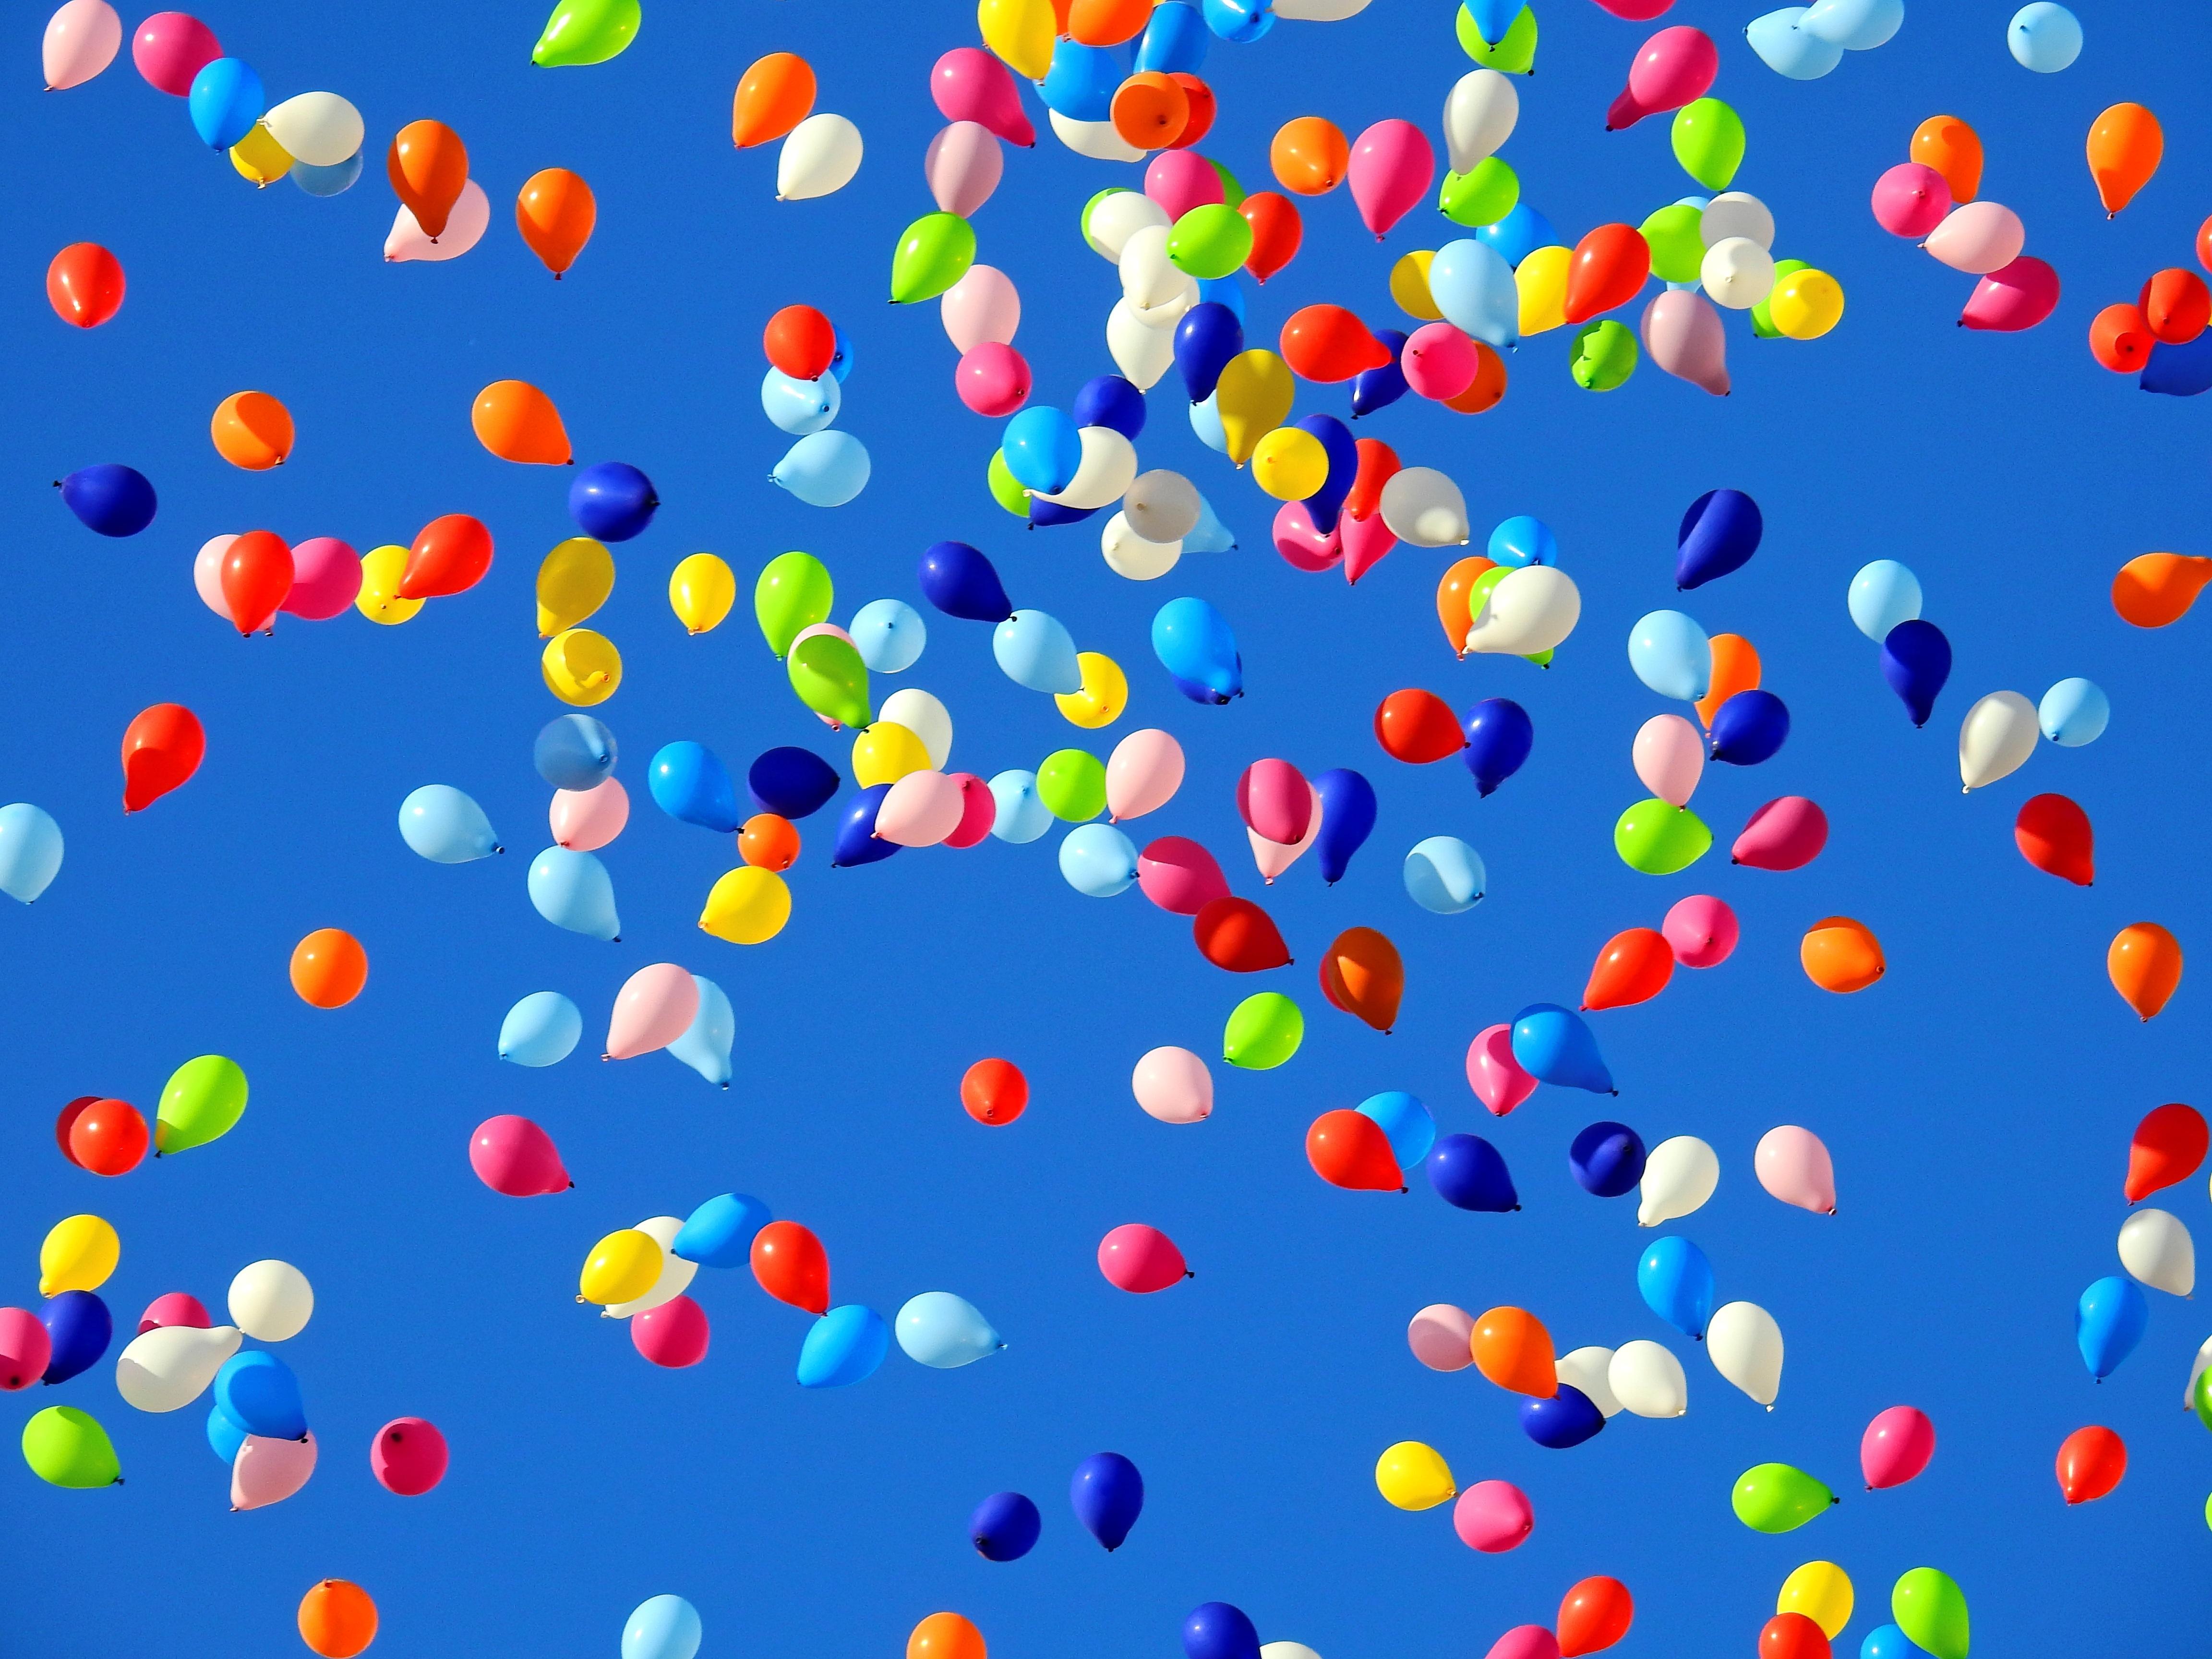 free images   sky  petal  balloon  celebration  pattern